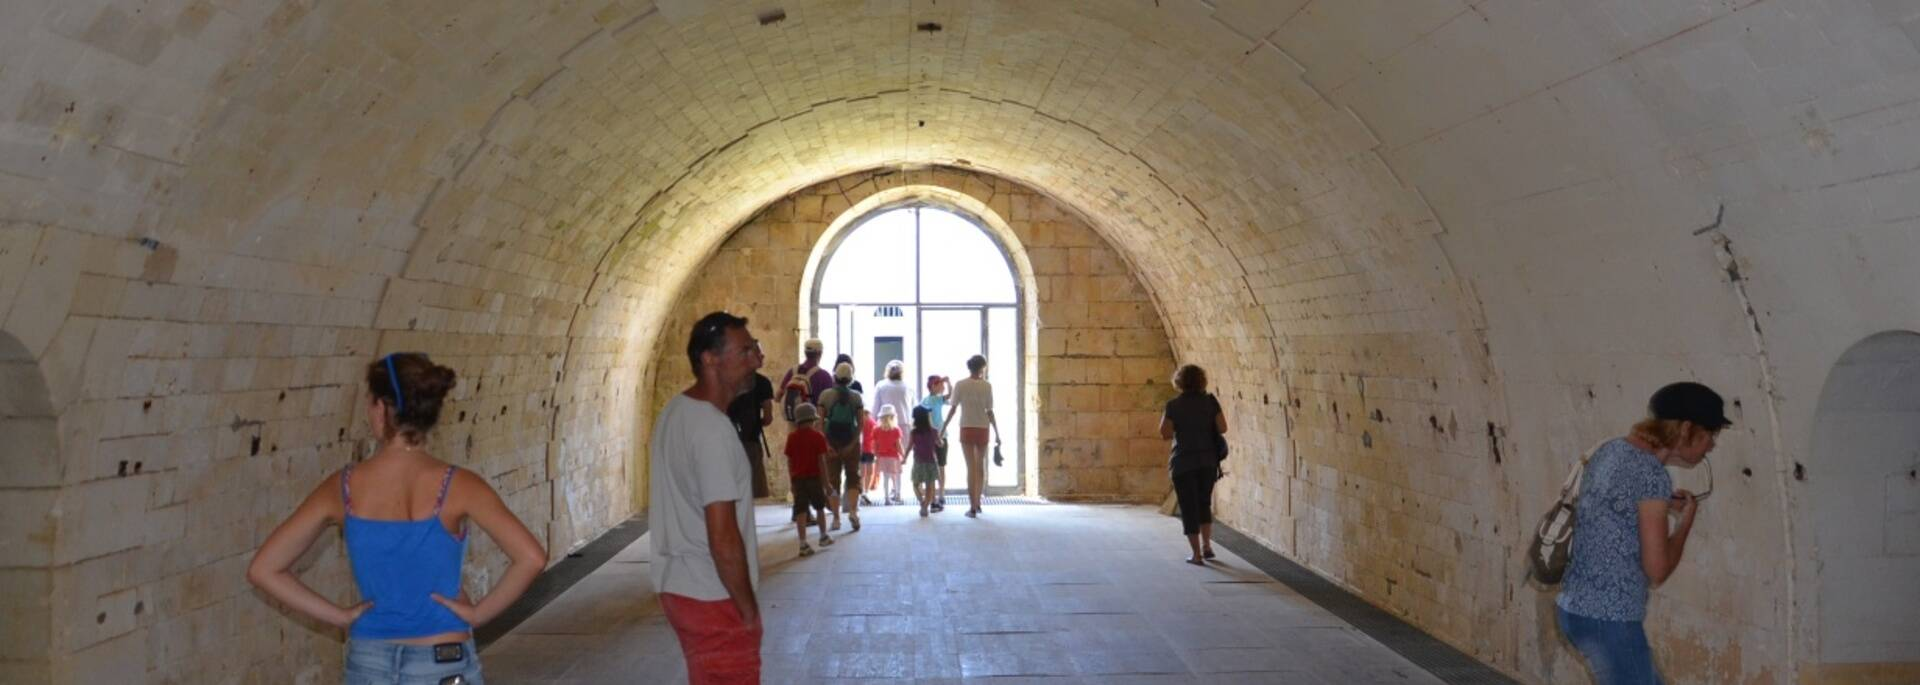 Visit of the blockhouses of Fort Liédot - ©Samuel Courtois